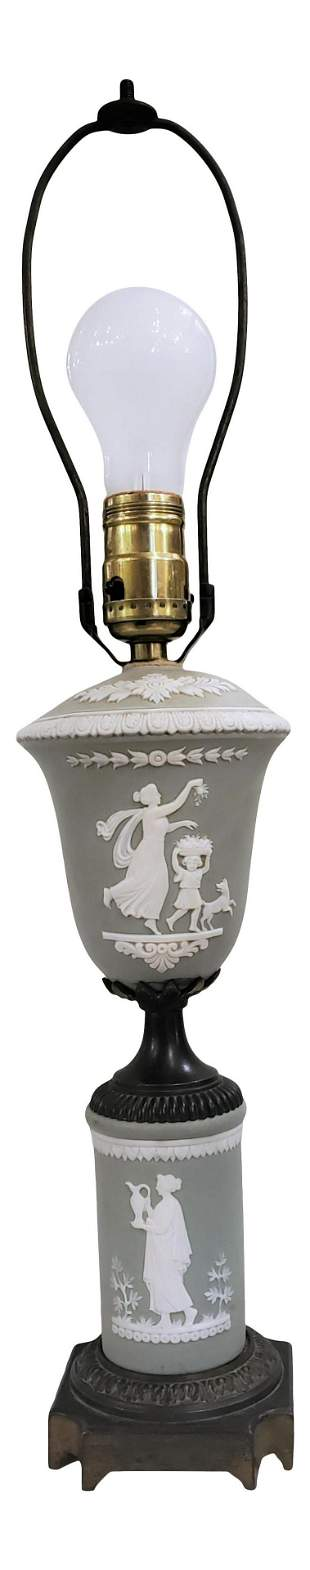 Vintage Wedgewood Porcelain Table lamp